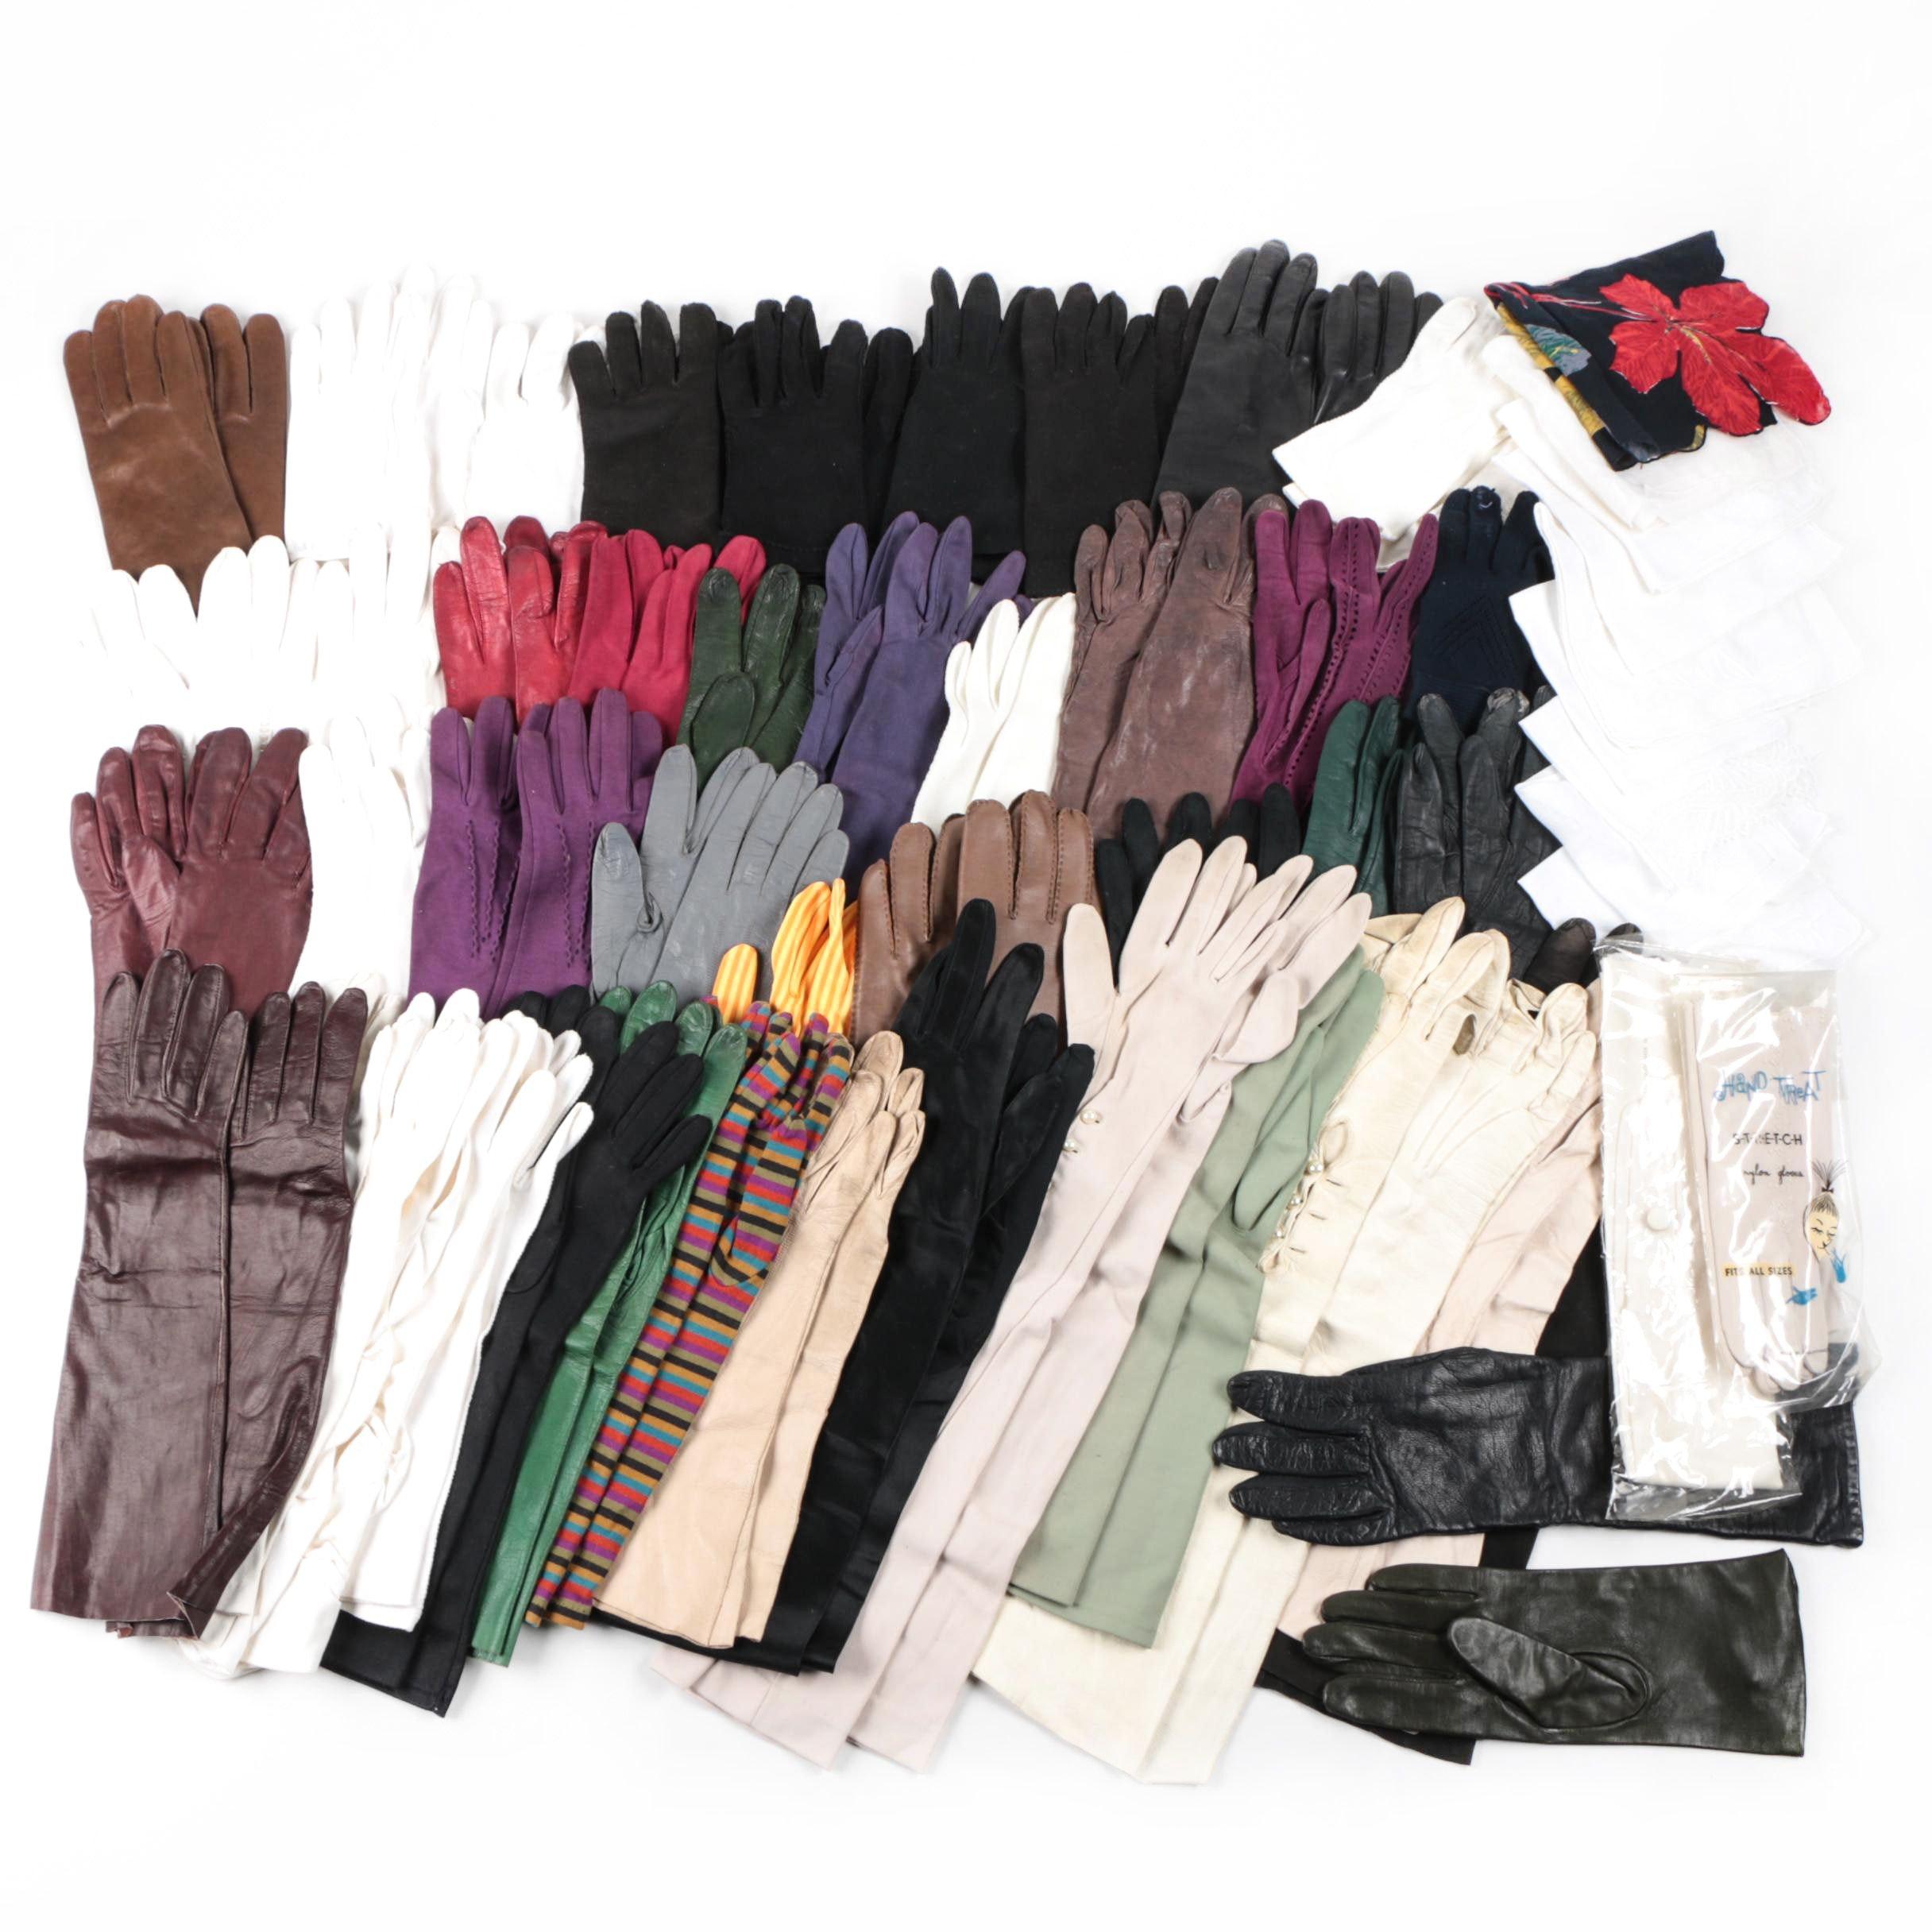 Vintage Glove and Handkerchief Assortment